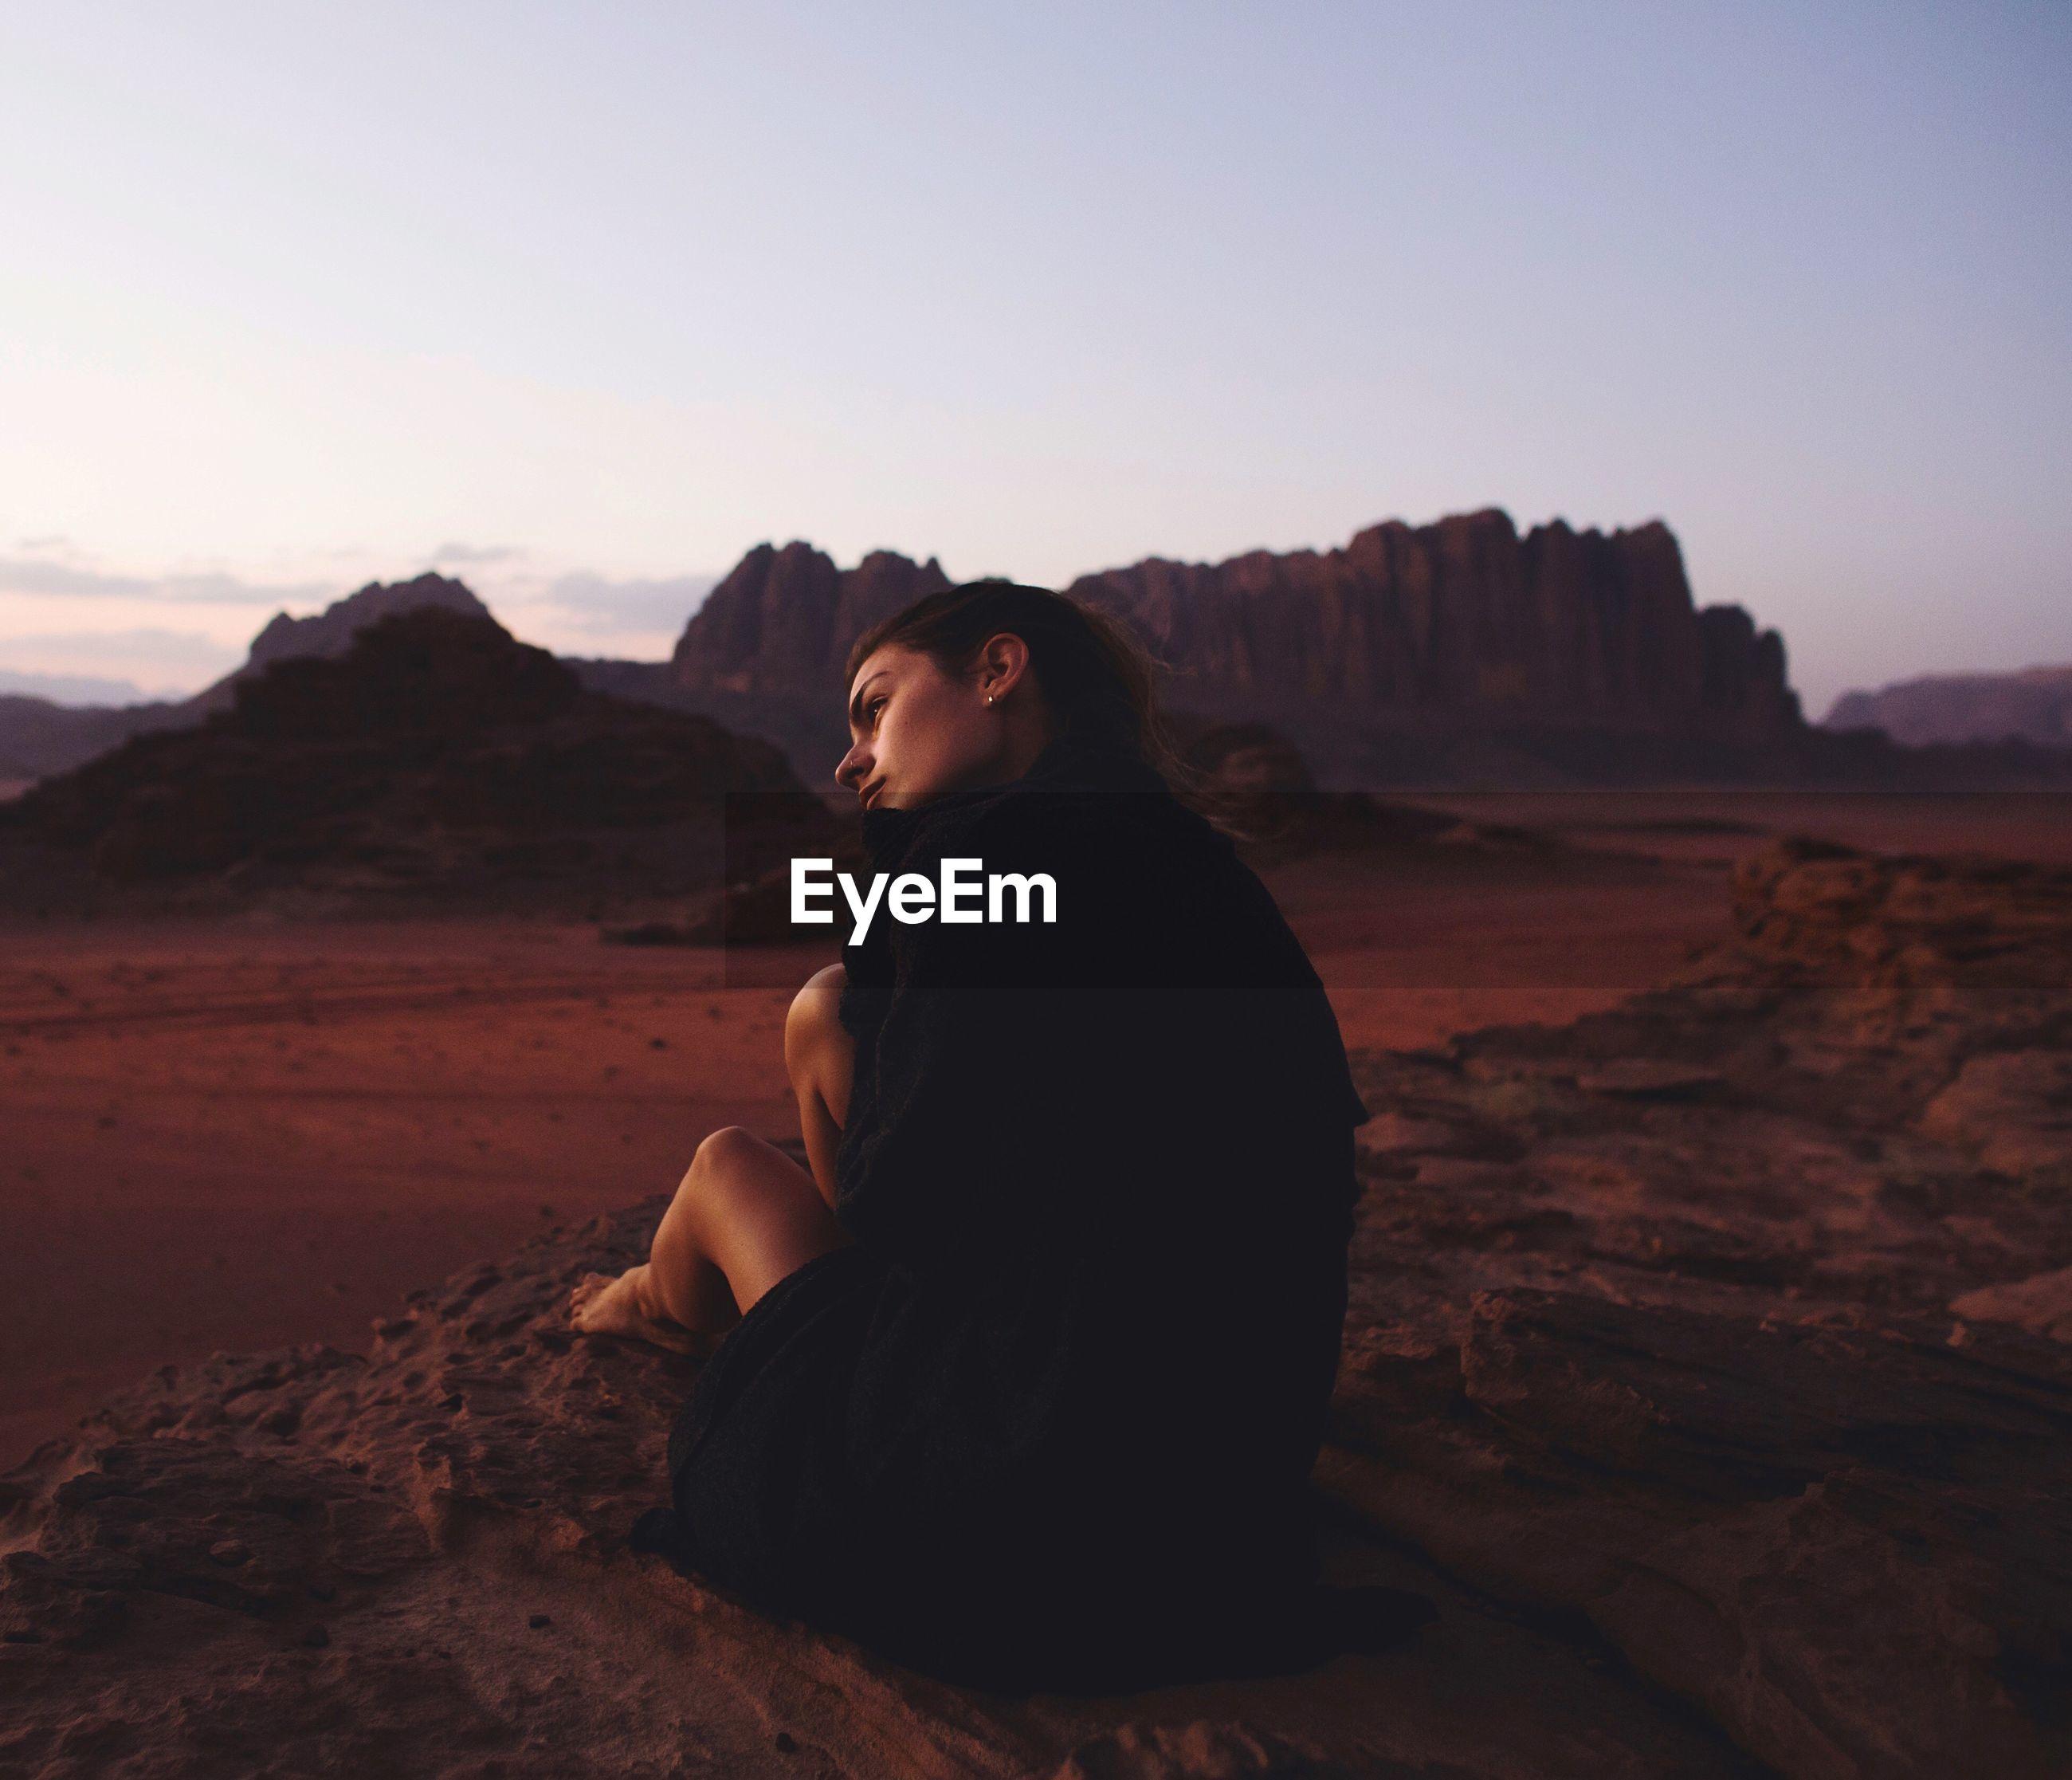 Woman sitting on rock in desert against clear sky